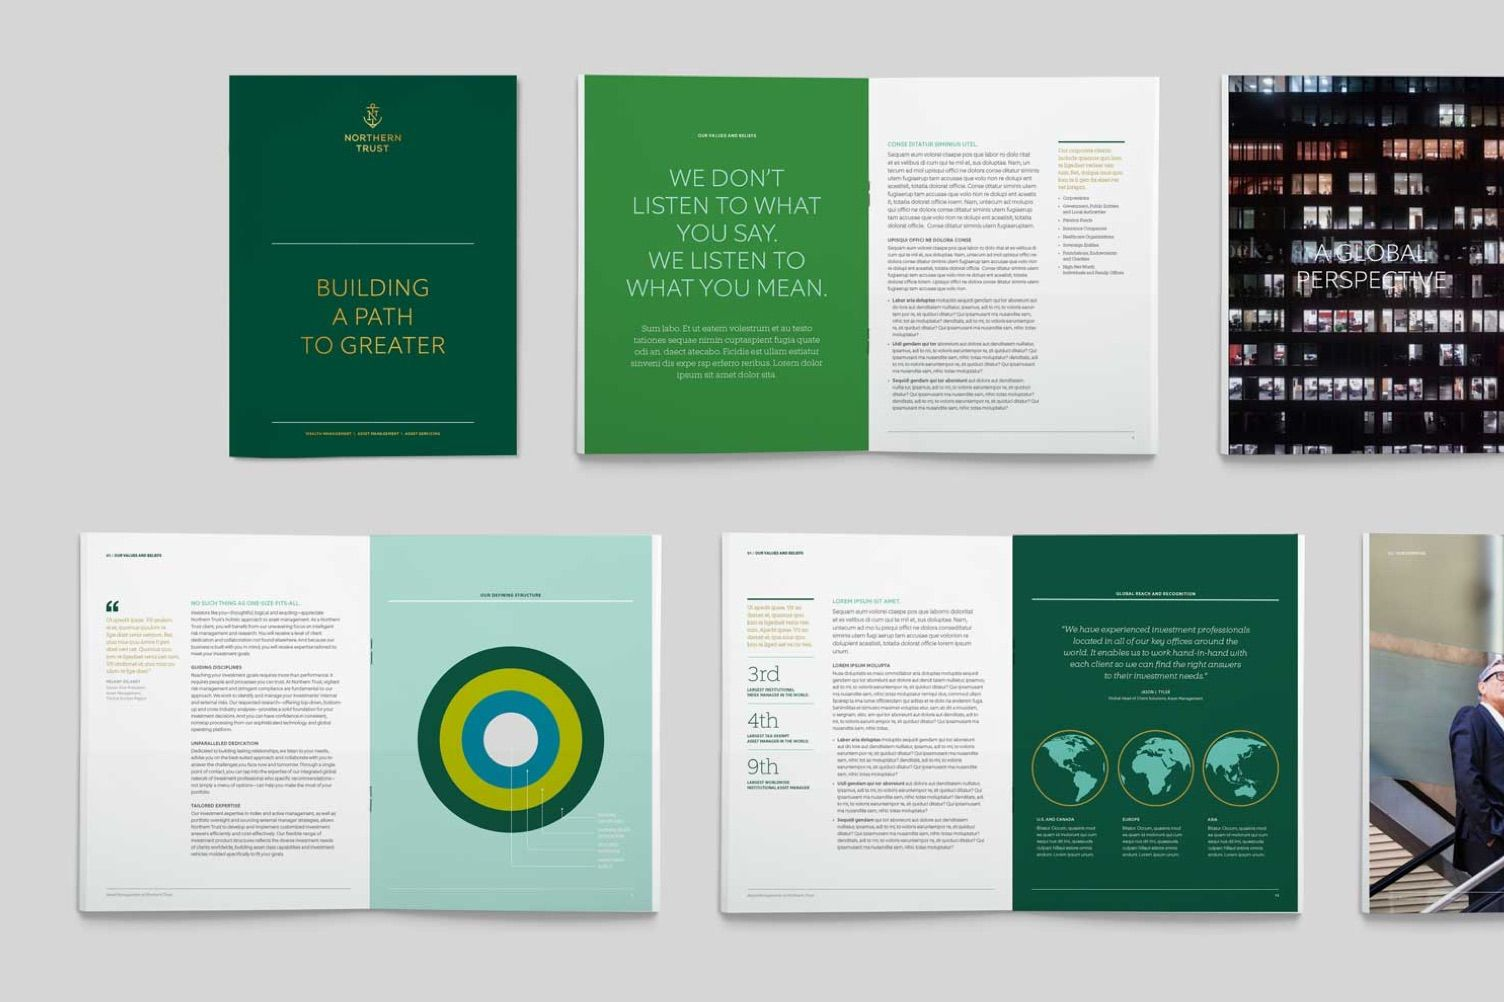 Northern Trust brochure interior spreads